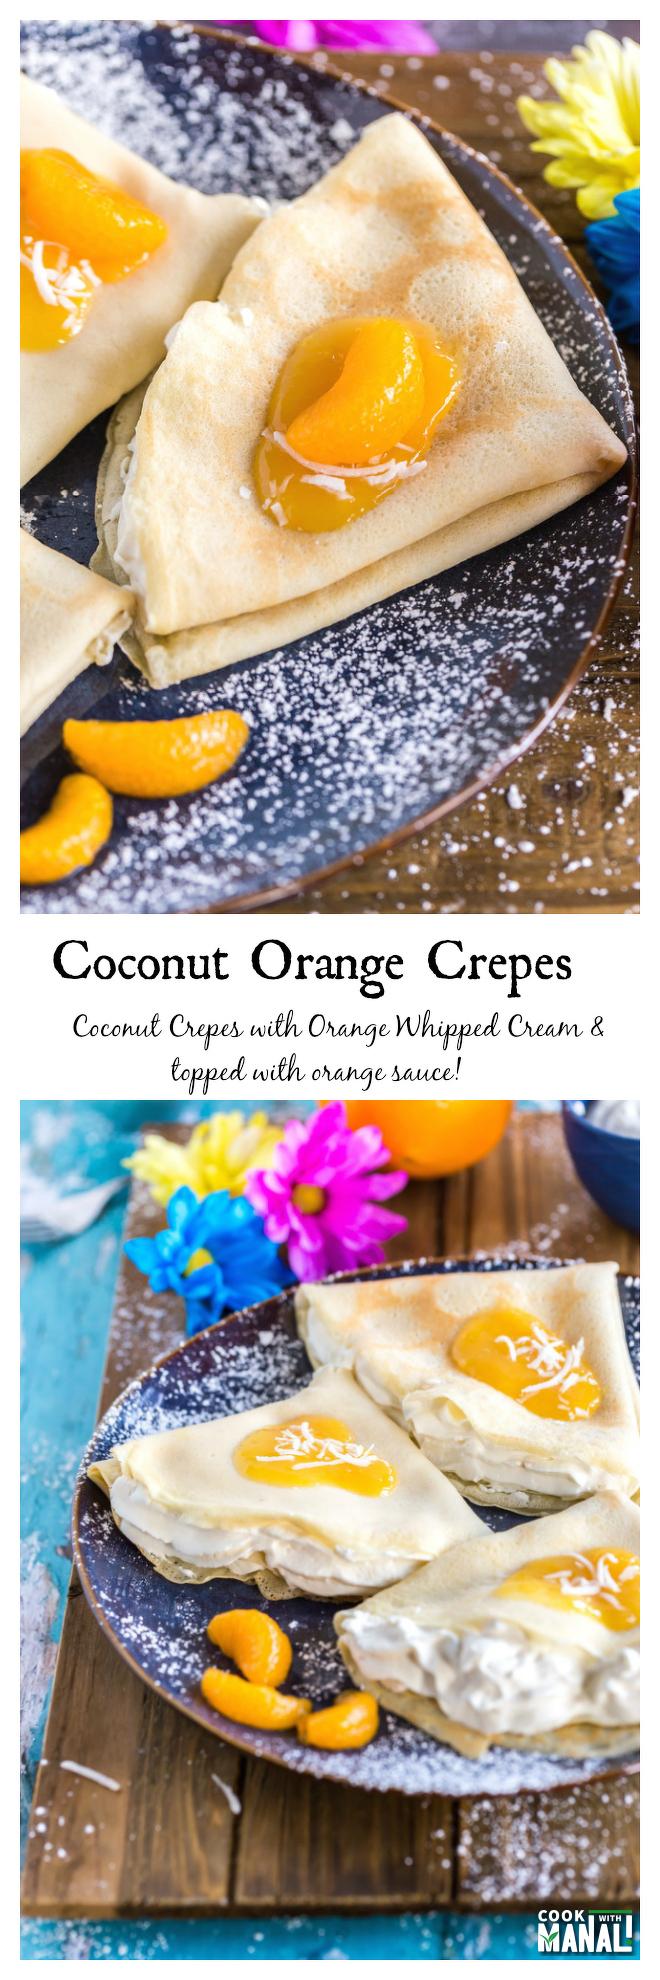 Coconut Orange Crepes-Collage